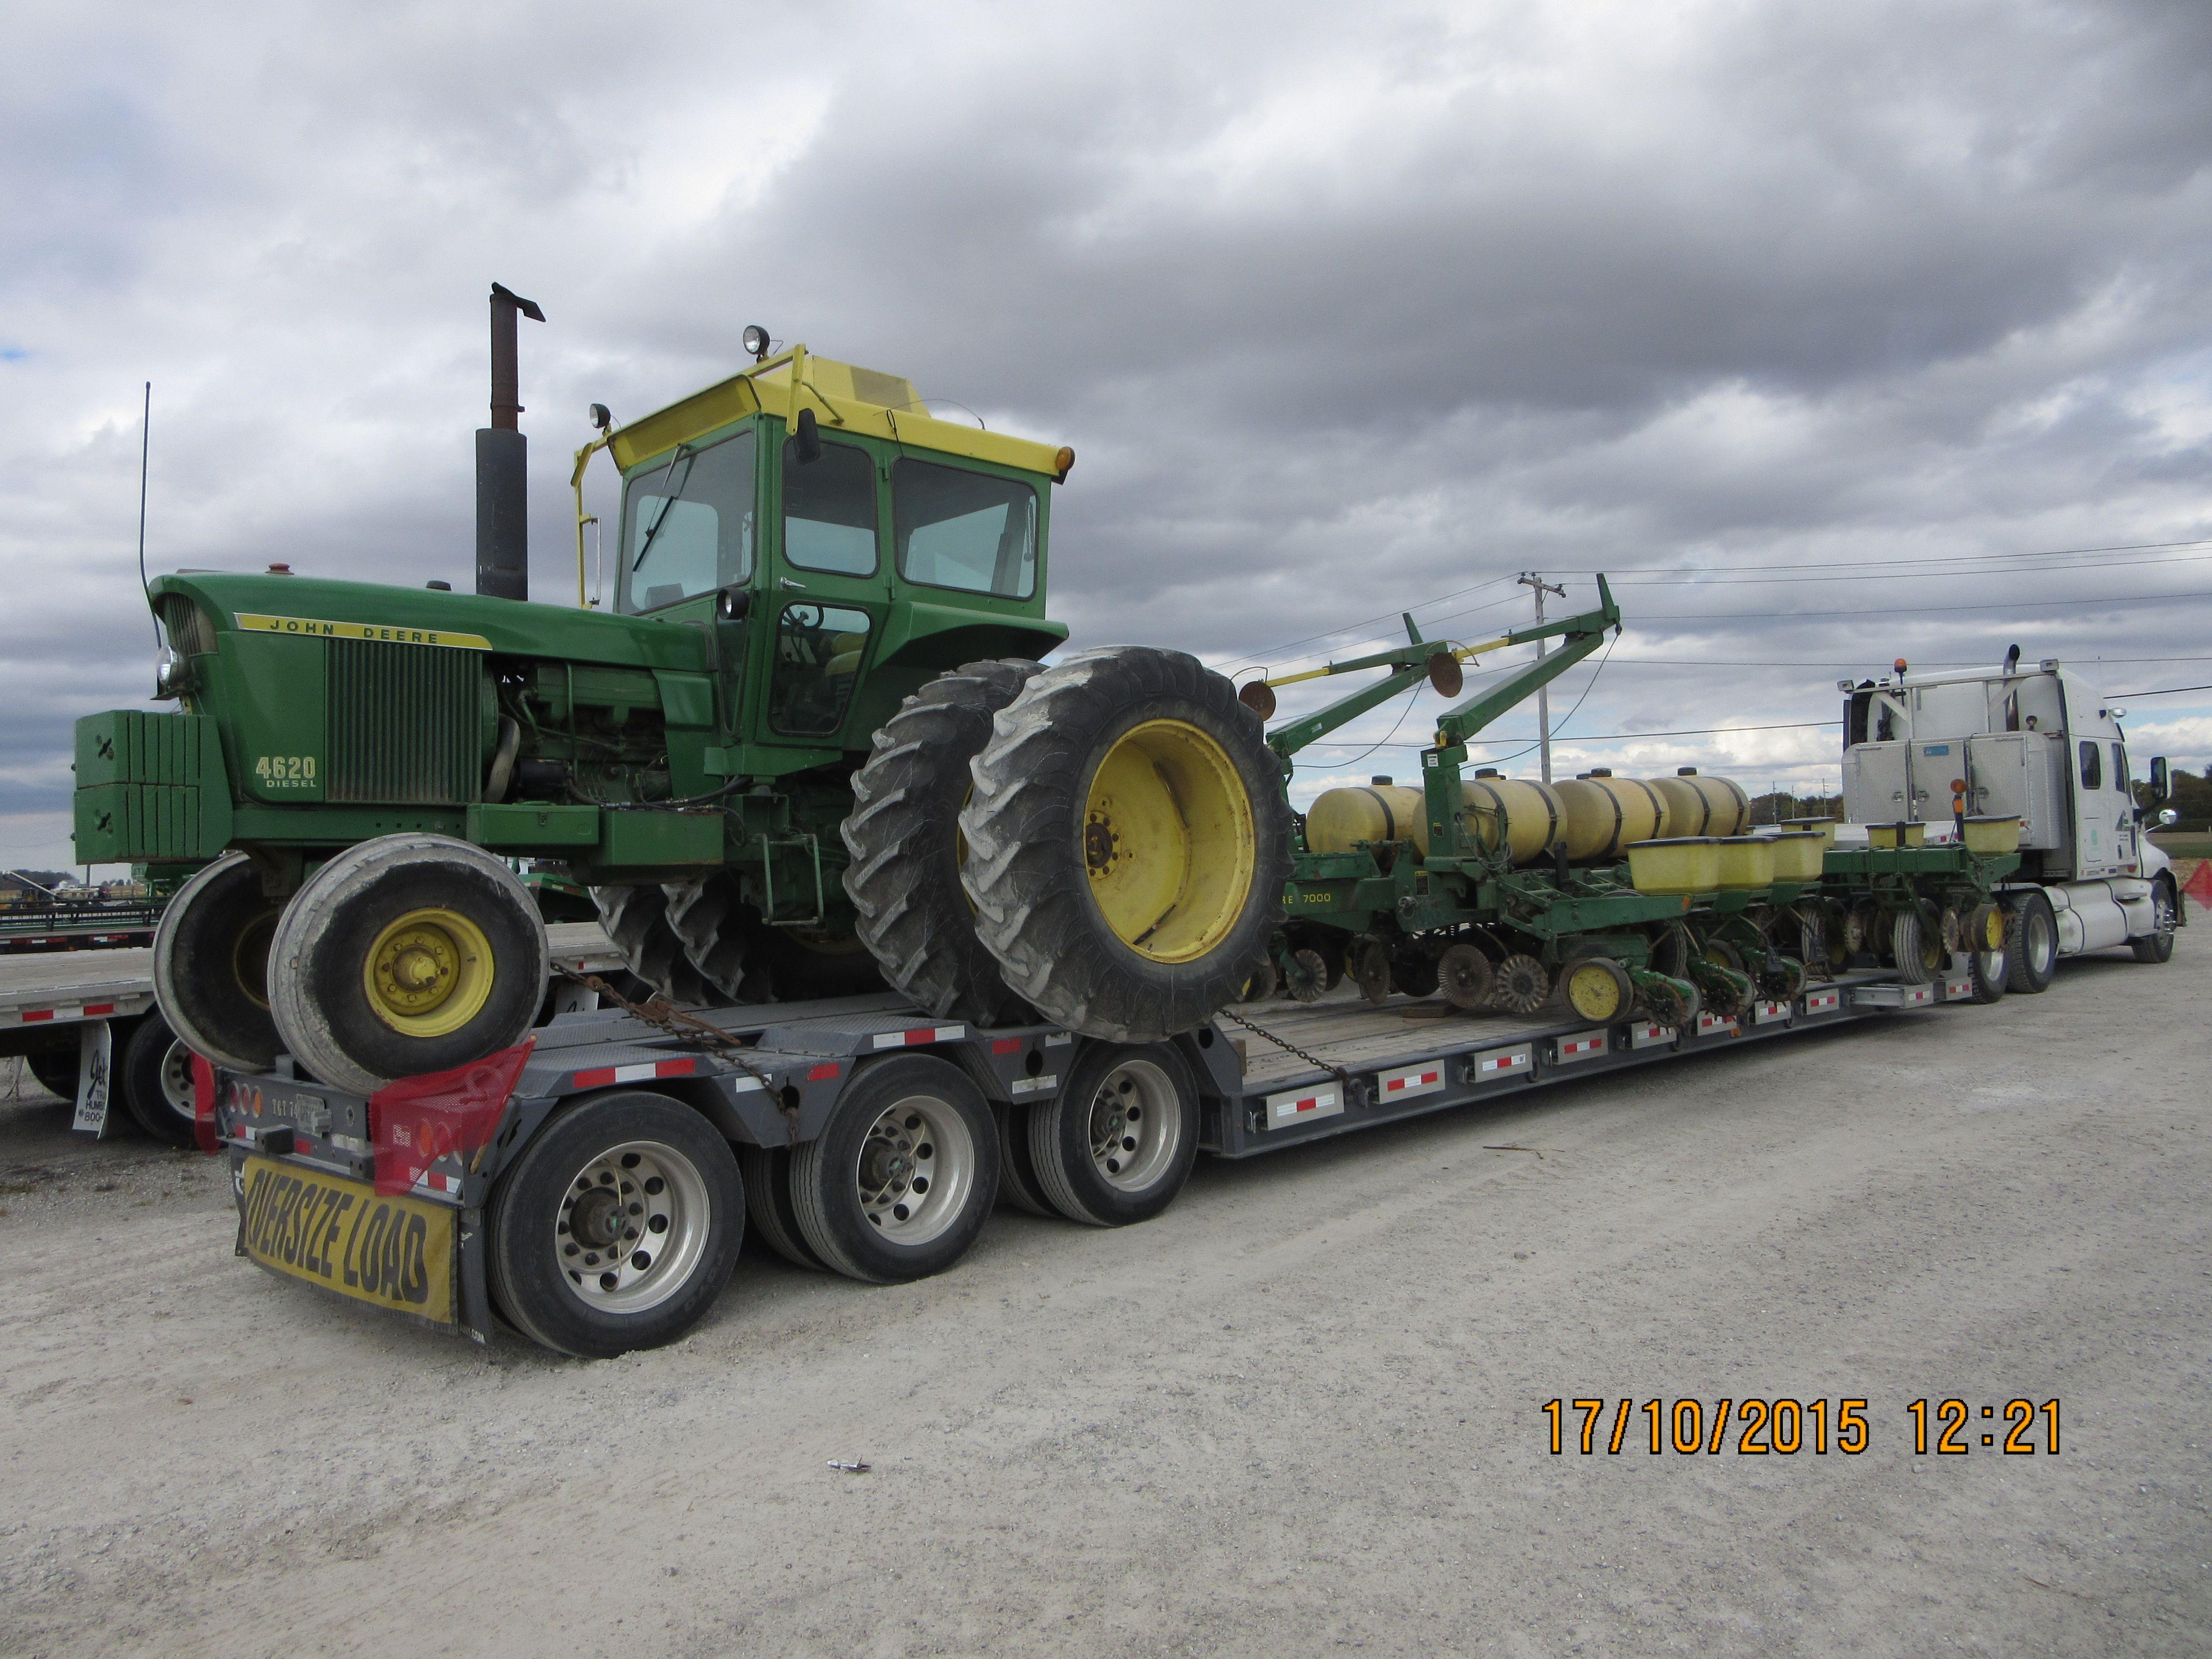 135hp John Deere 4620 12 Row Max Emerge 7000 Corn Planter Tri